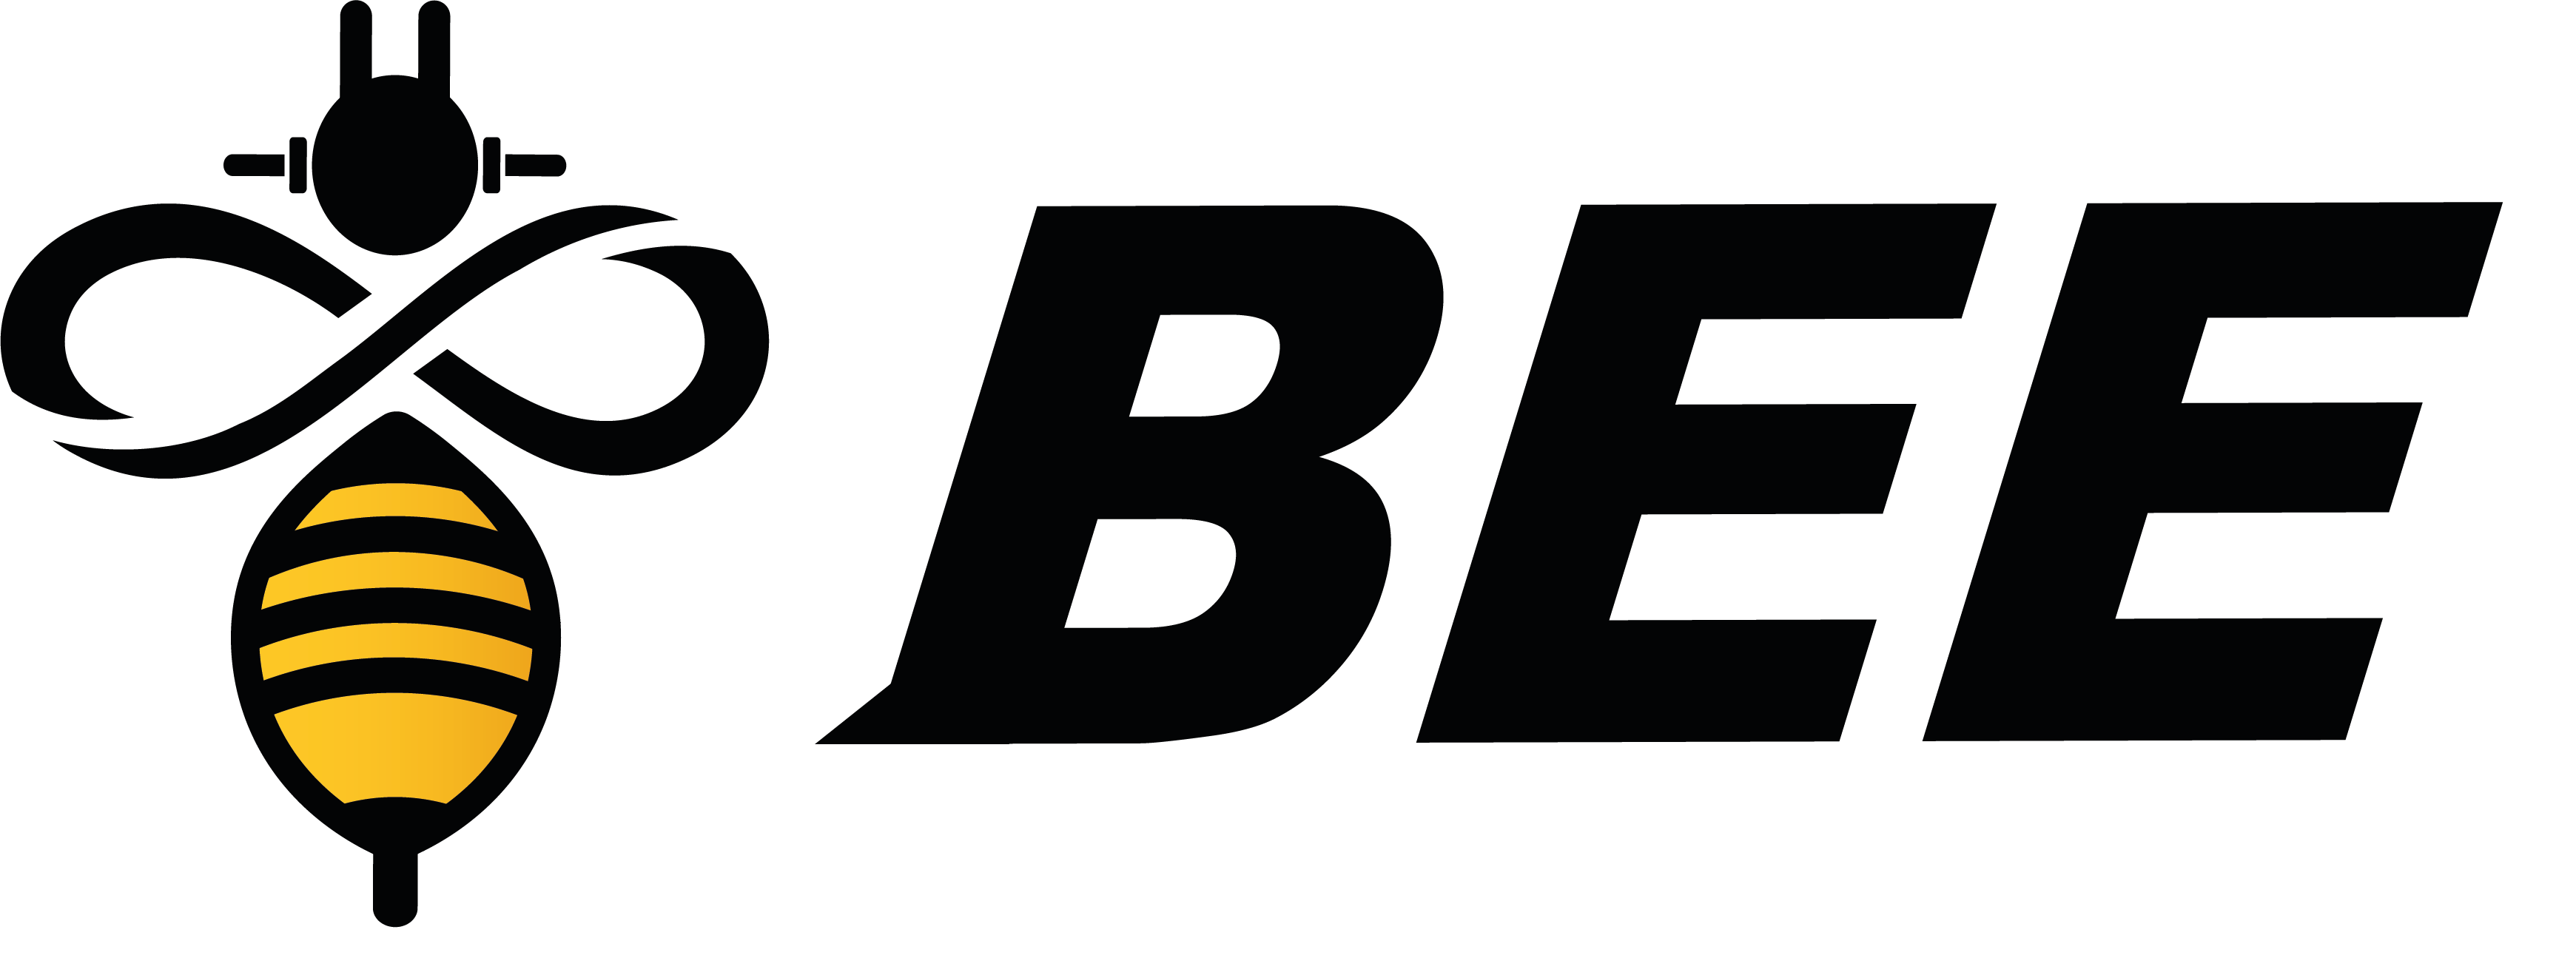 bee negro